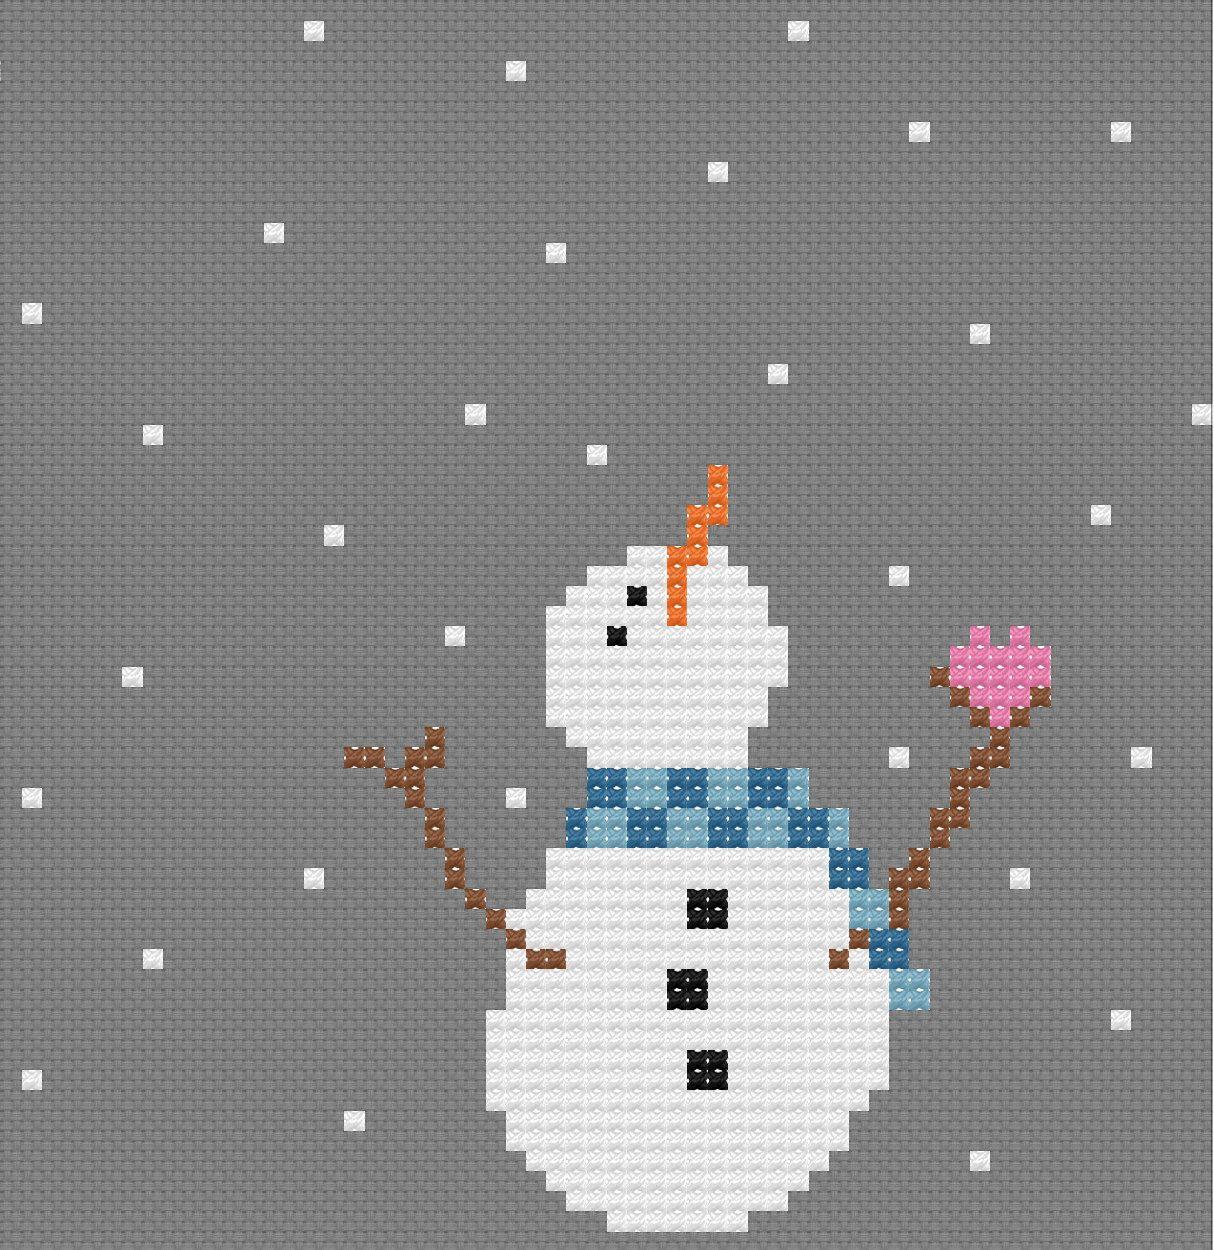 free snowman cross stitch patterns - Google Search   Cross Stitch ...